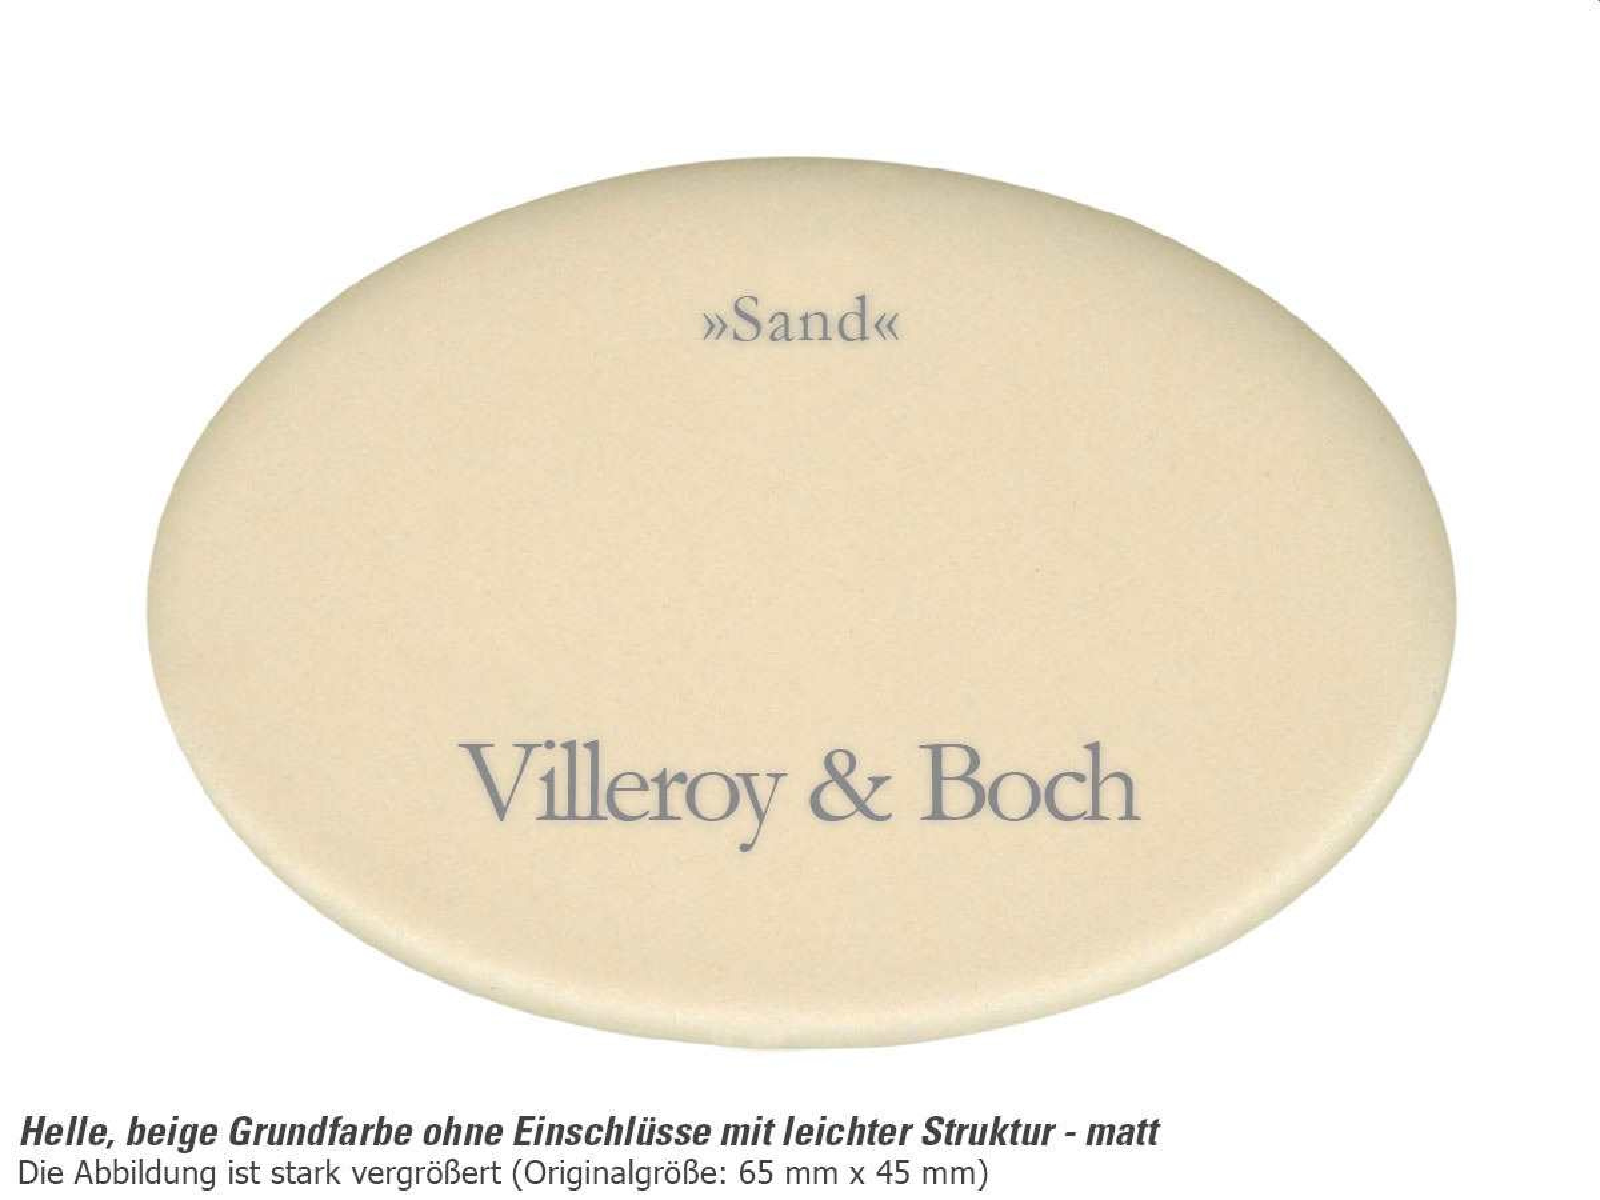 Villeroy & Boch Flavia 60 Sand - 3304 02 i5 Keramikspüle Exzenterbetätigung